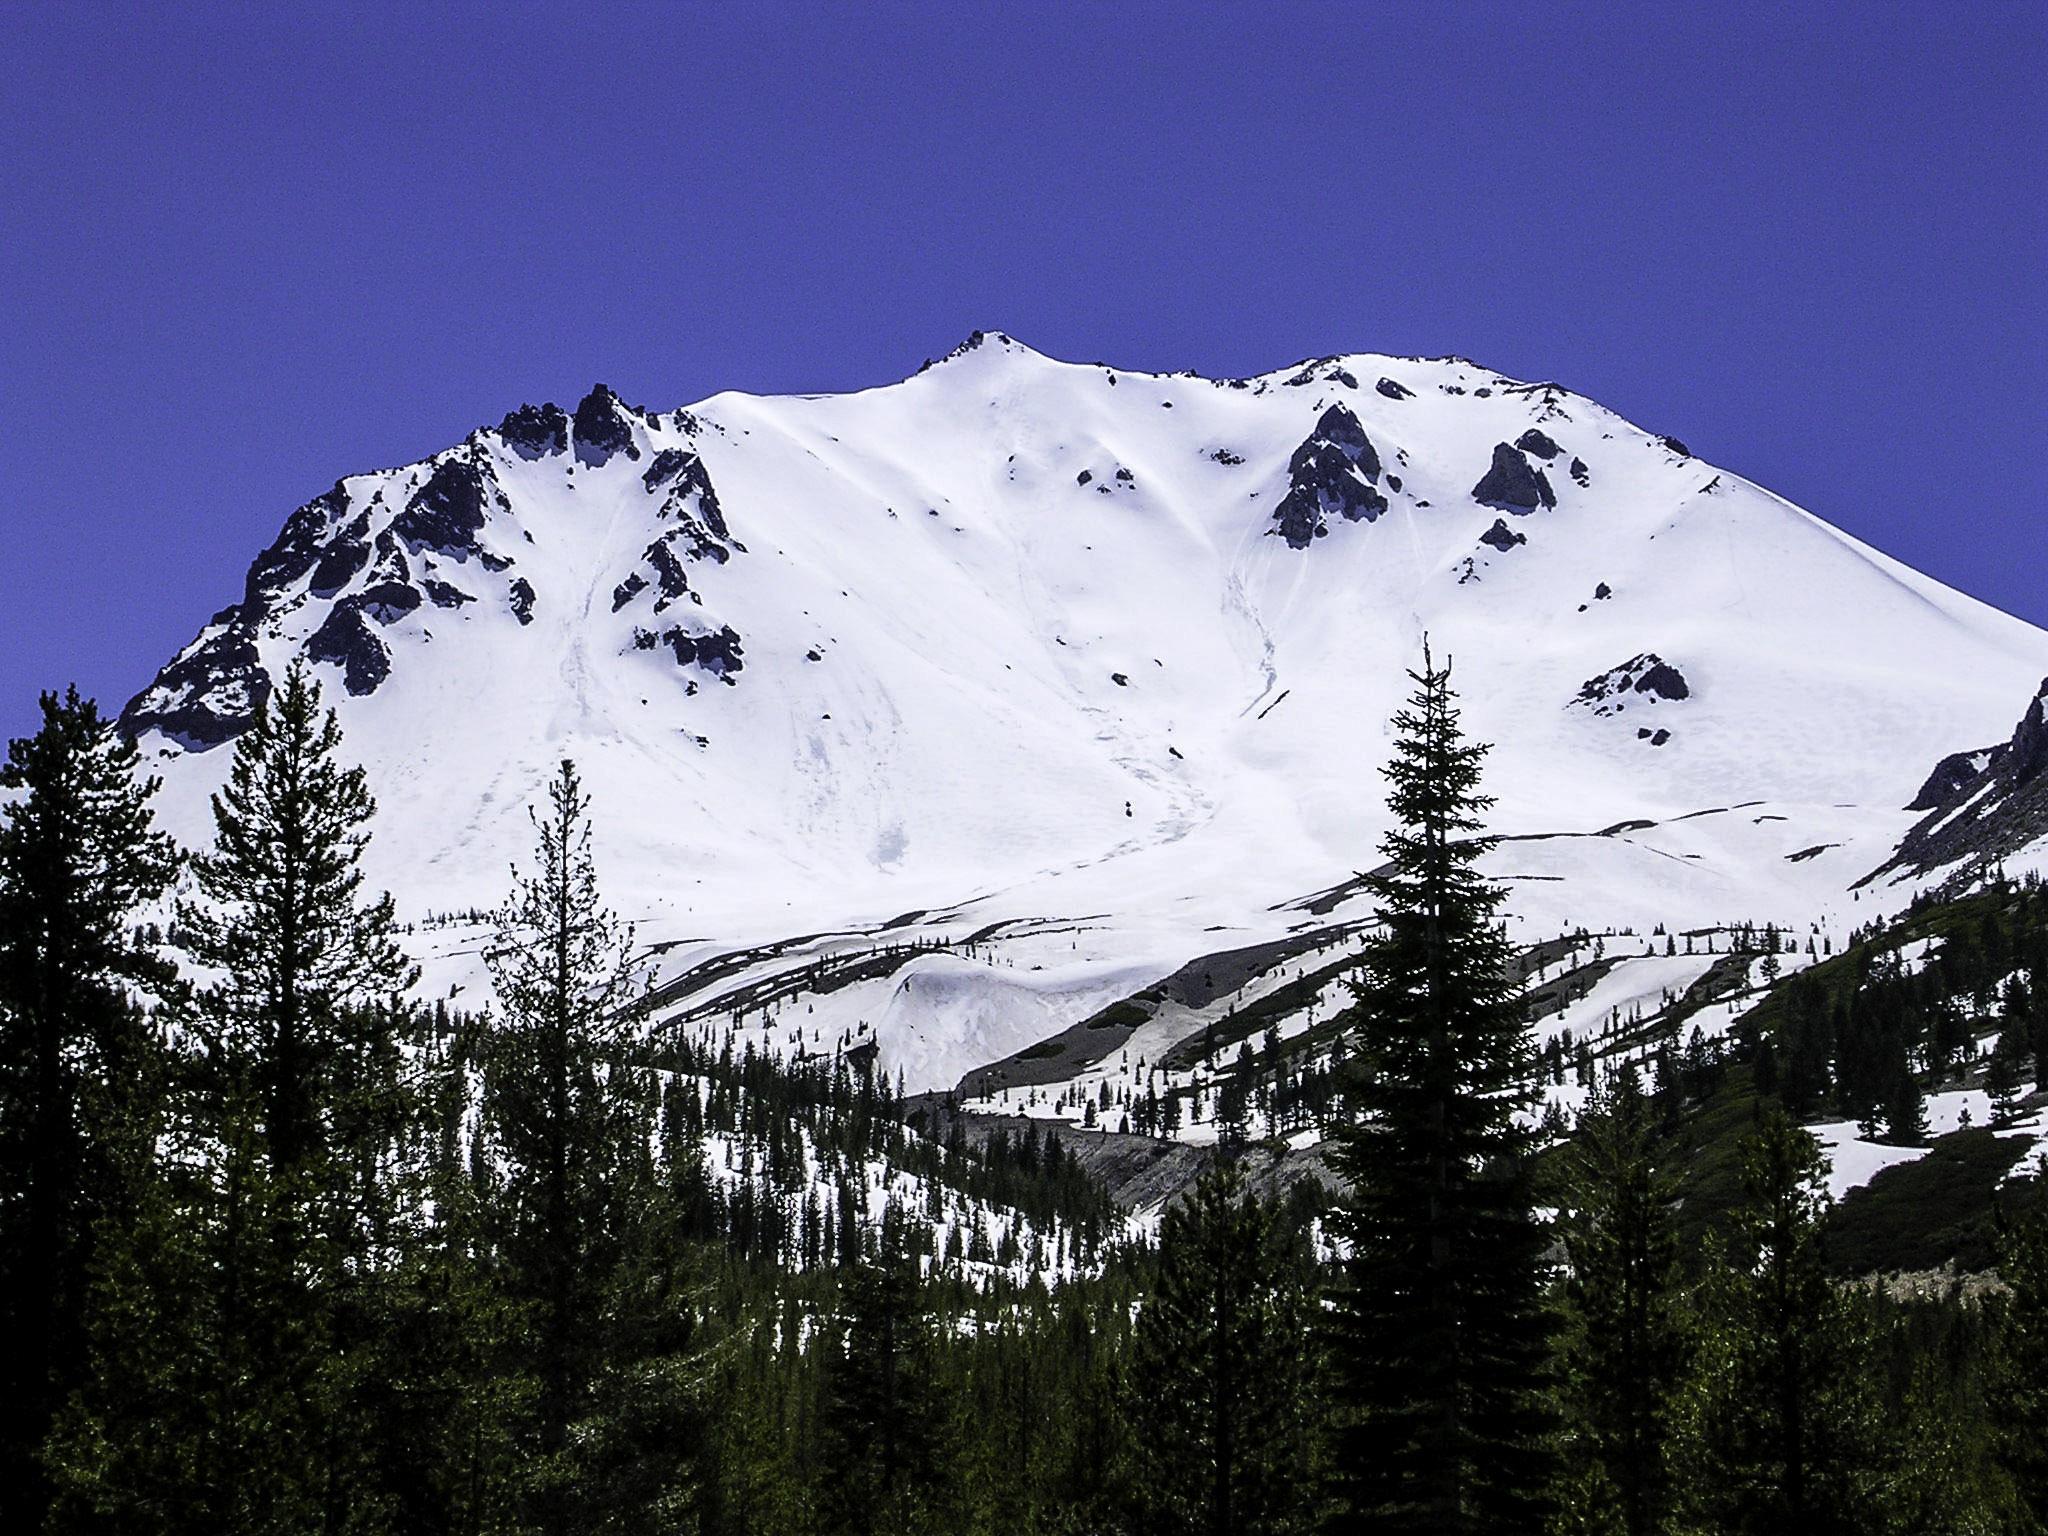 Snow covered Lassen Peak in Lassen Volcanic National Park.